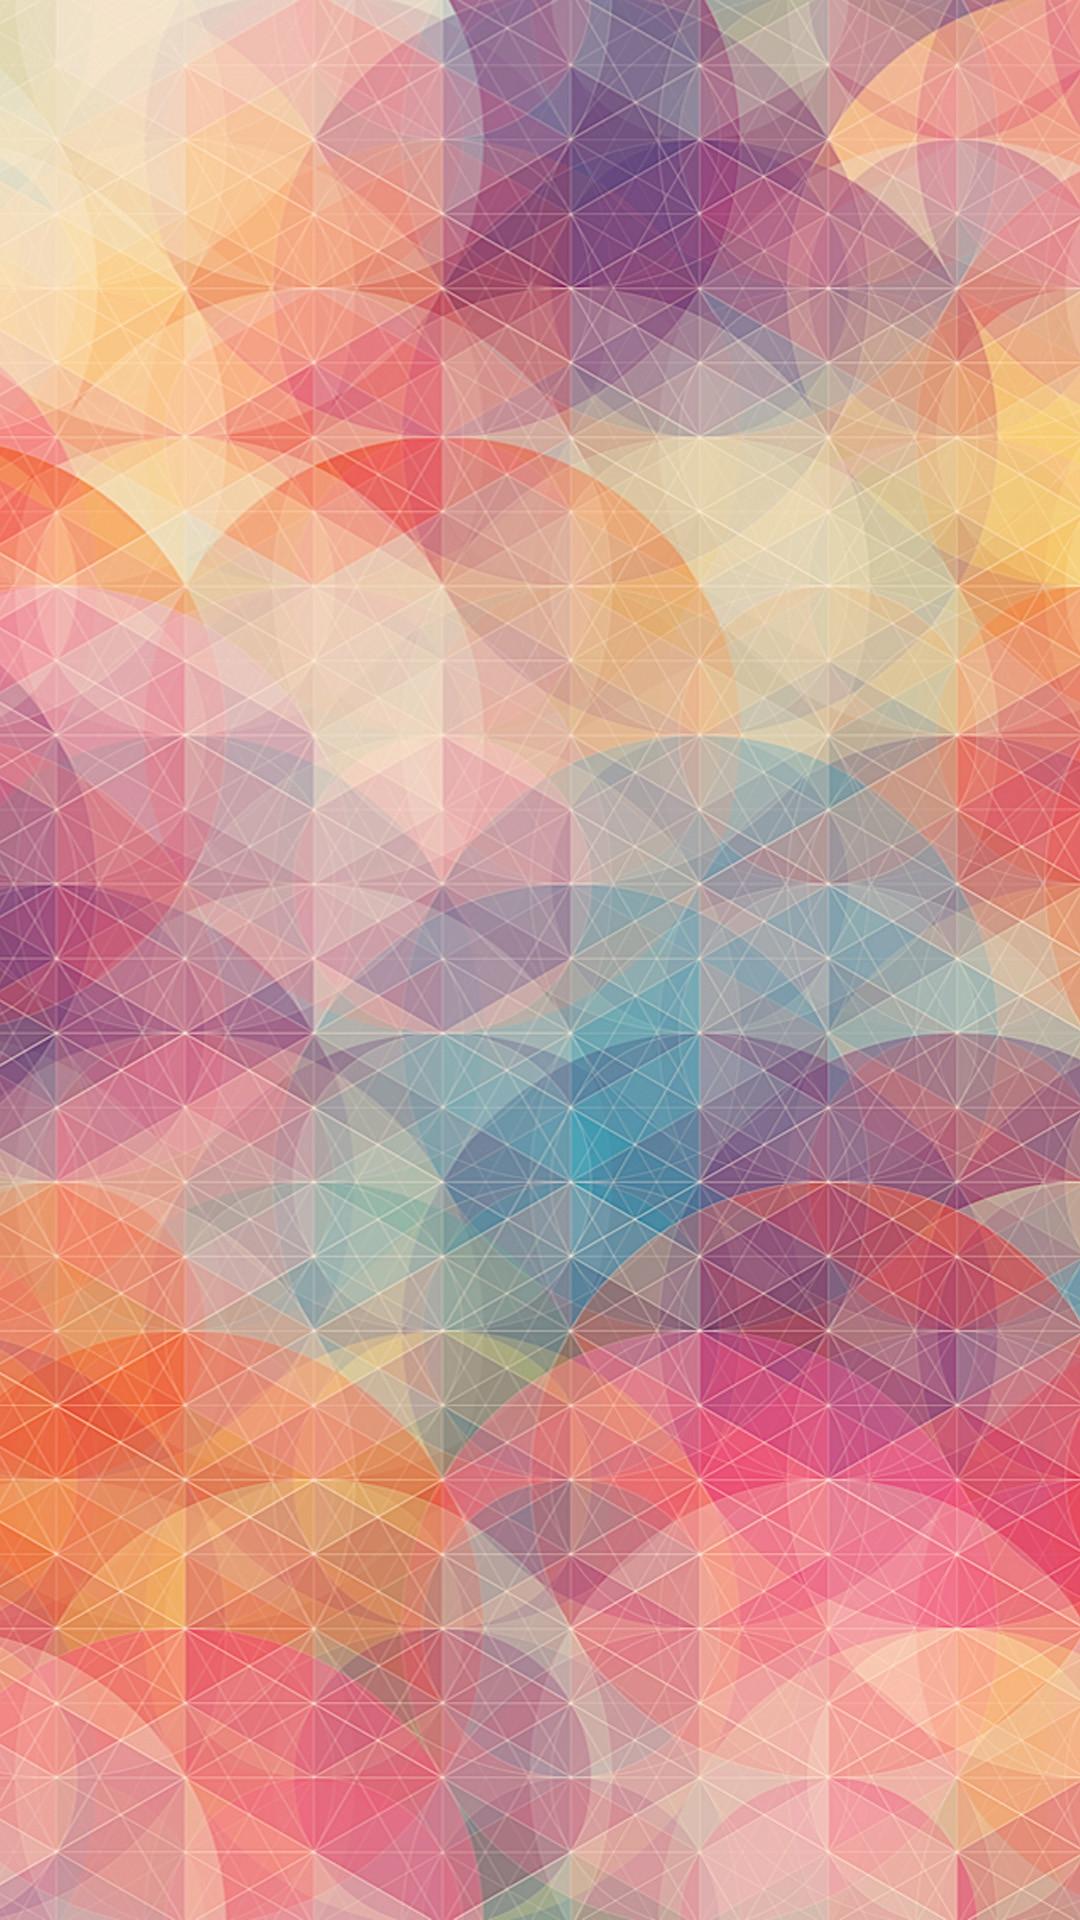 Illustration Samsung Galaxy S5 Wallpapers 71 .jpg (1080×1920)